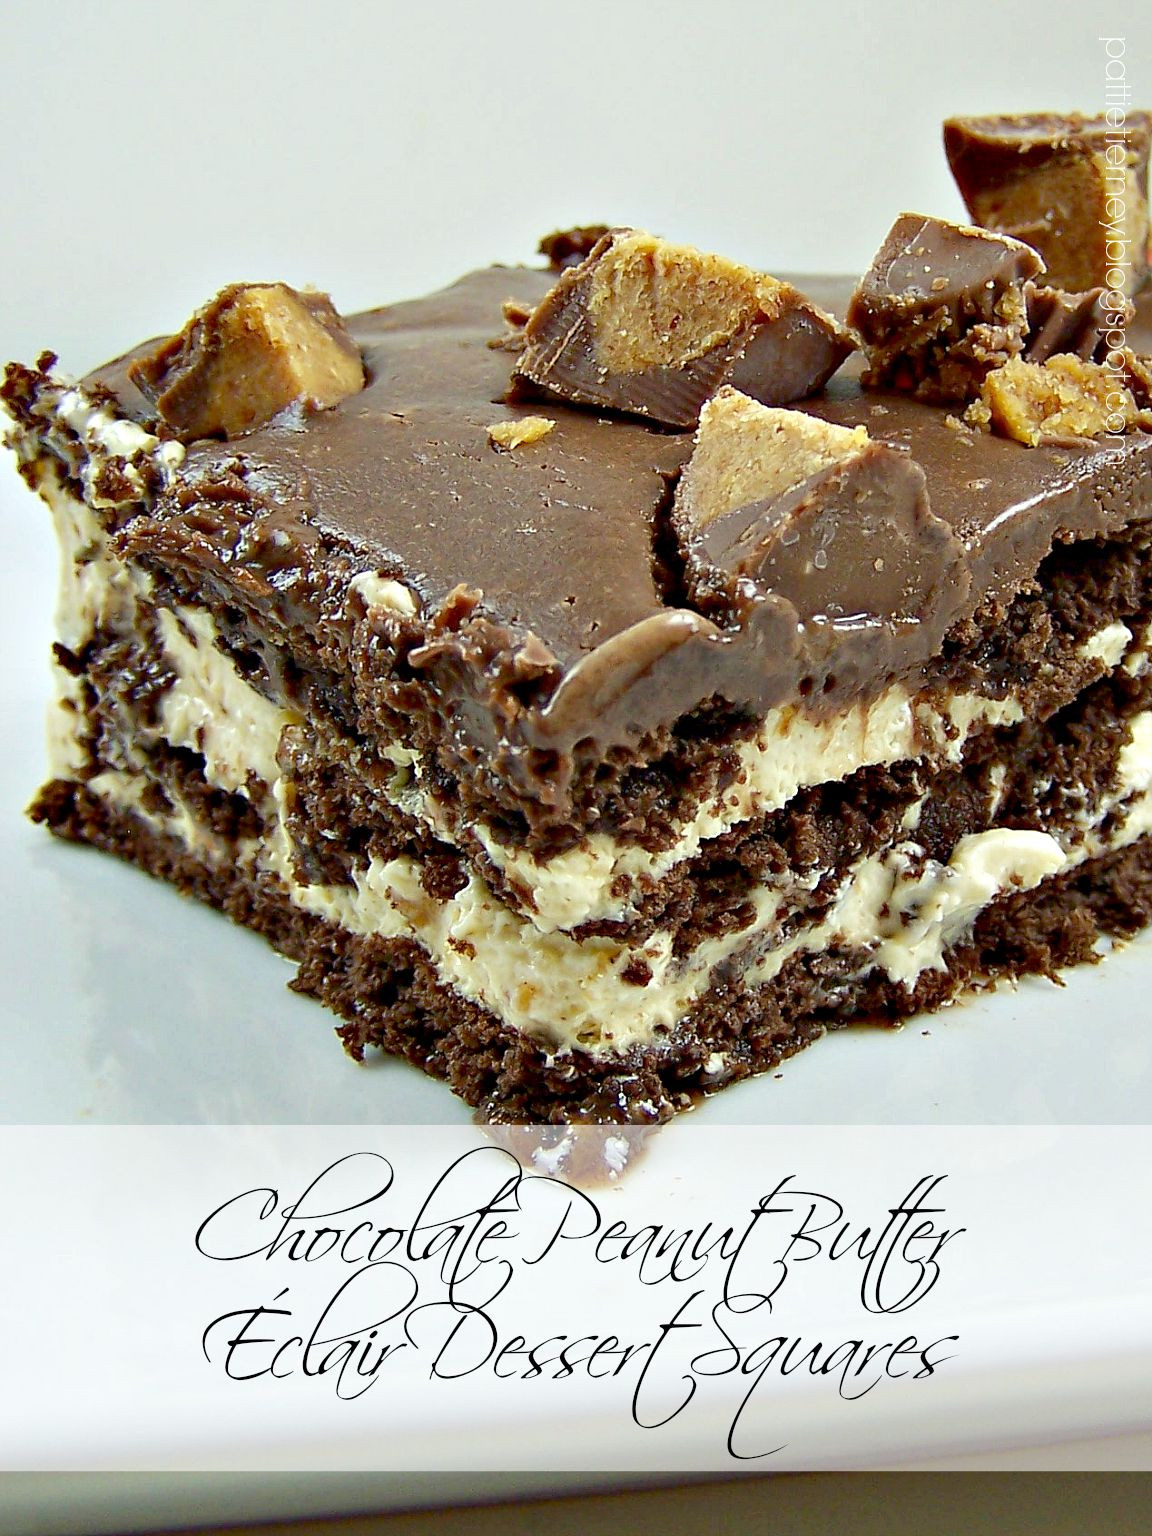 Chocolate Peanut Butter Dessert Recipe  Olla Podrida Chocolate Peanut Butter Éclair Dessert Squares